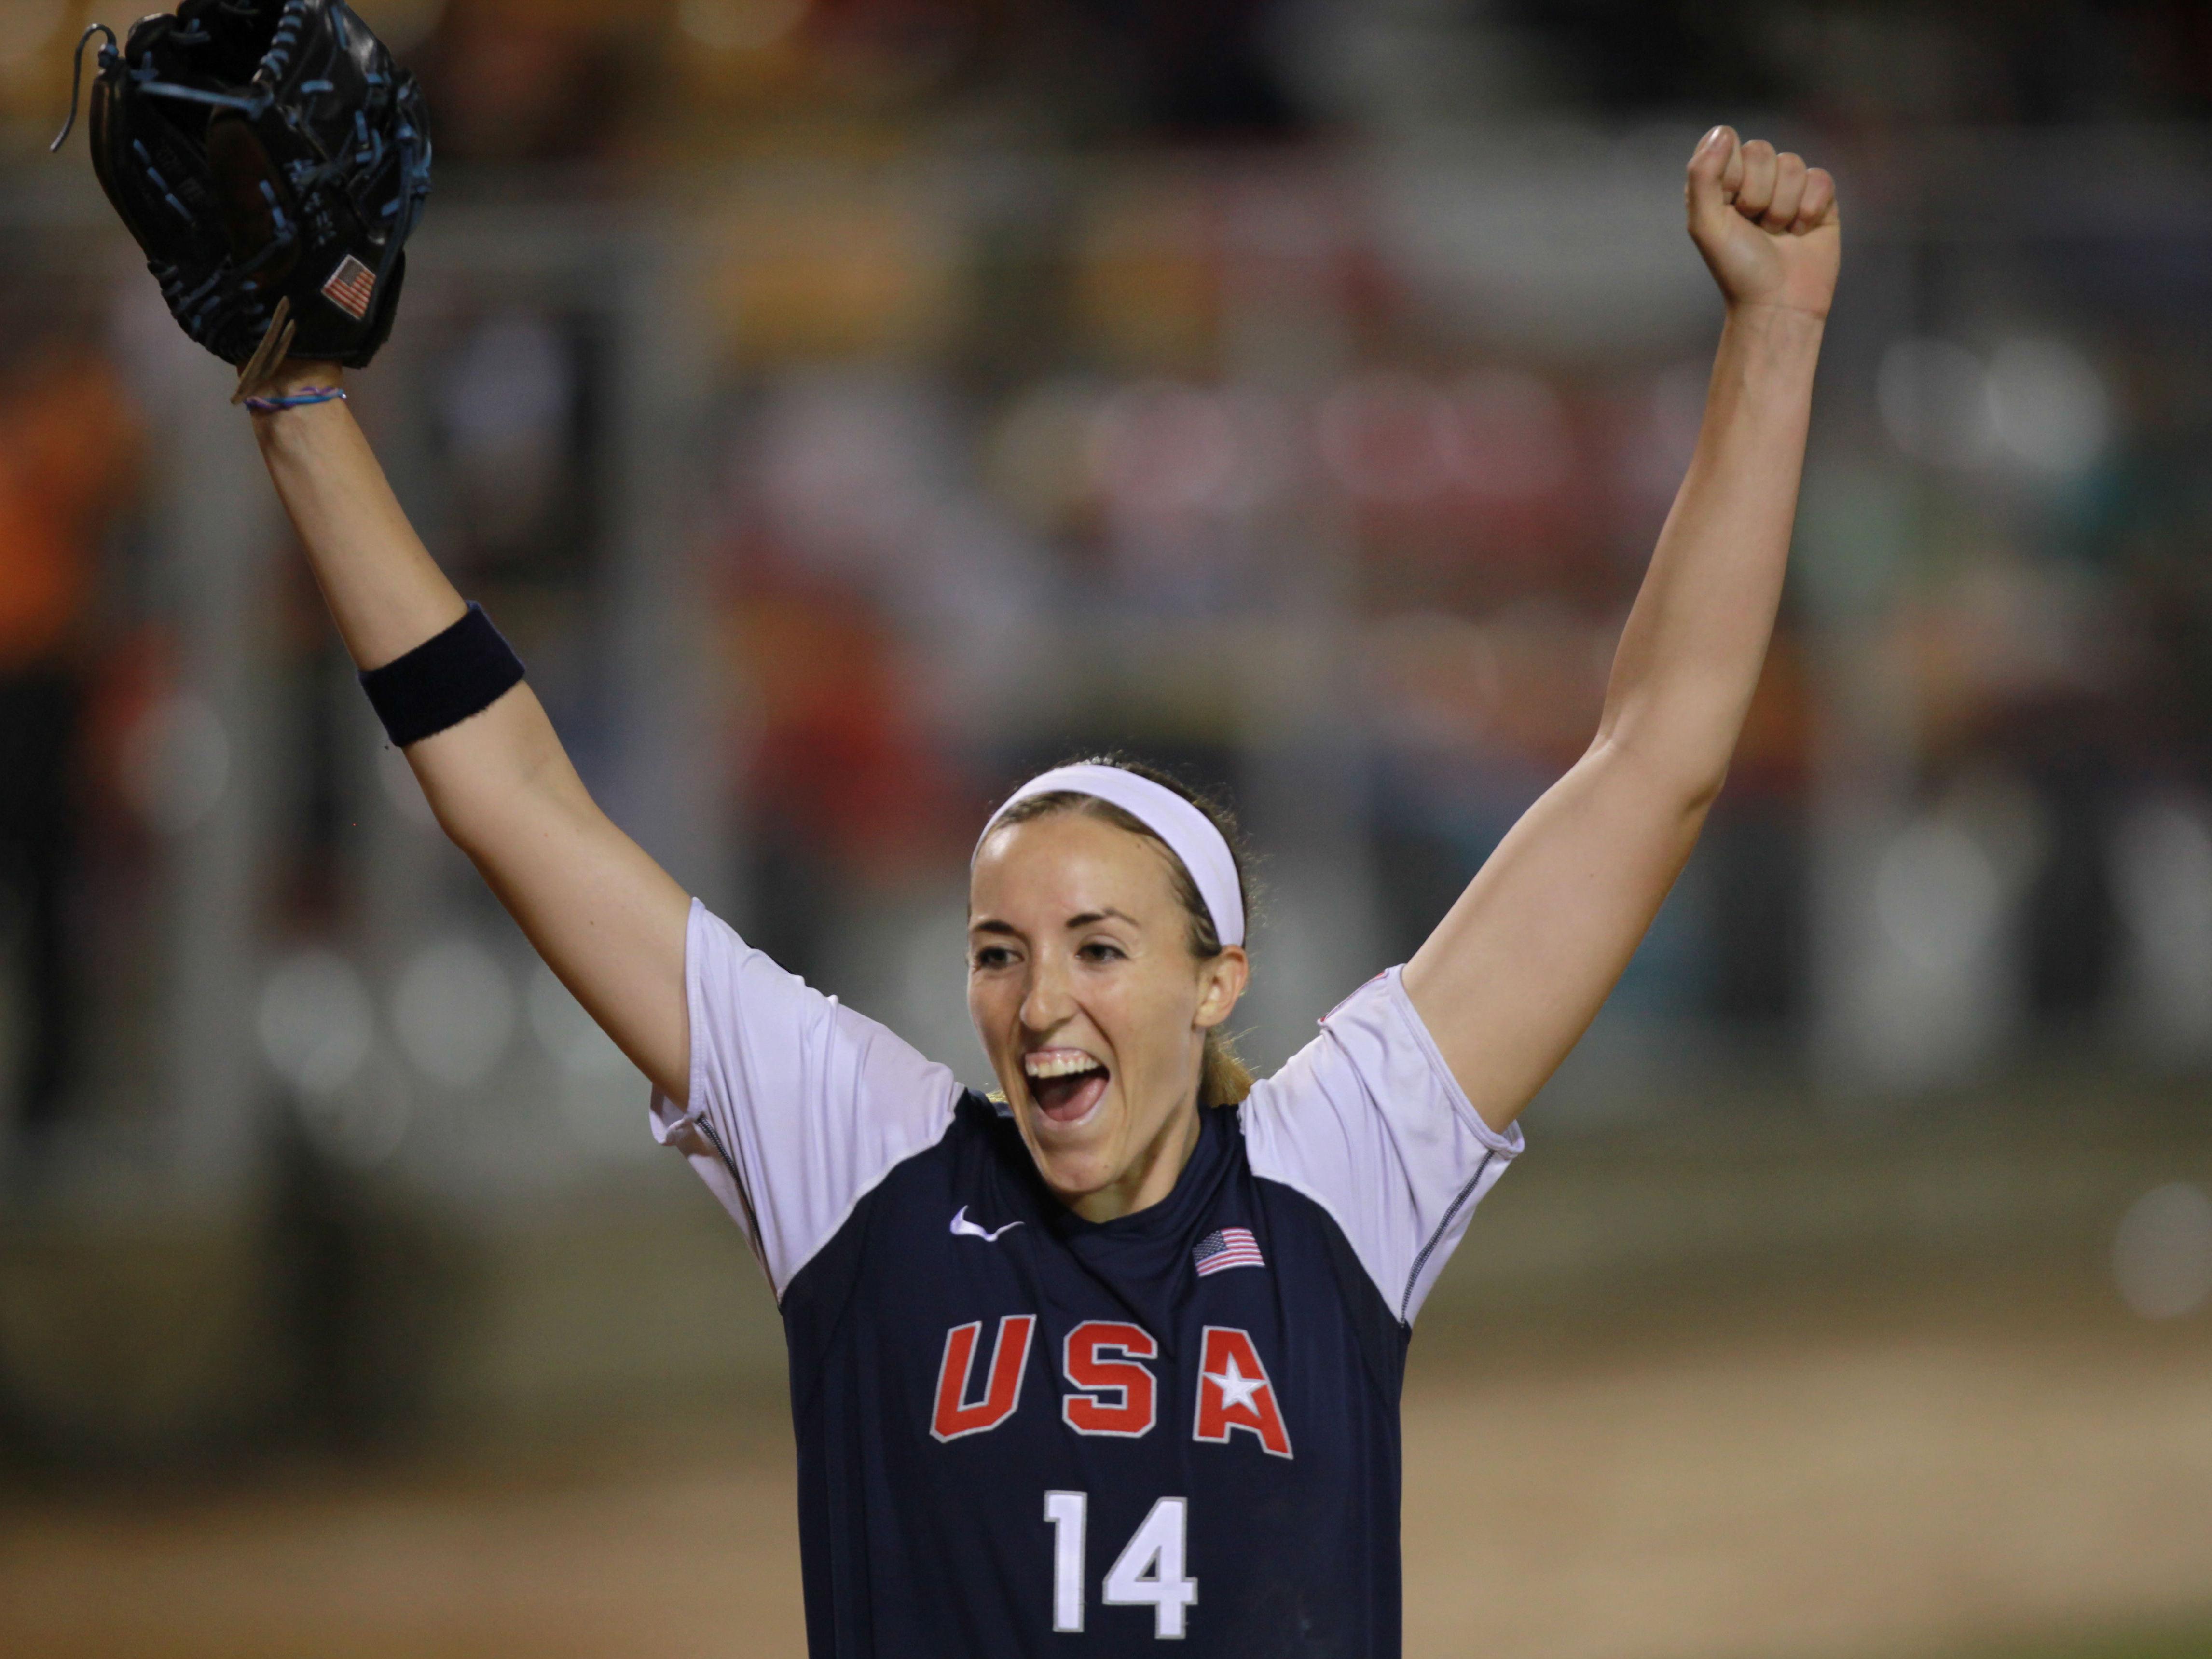 Softball Pitcher Monica Abbott Signs Record $1 Million ...